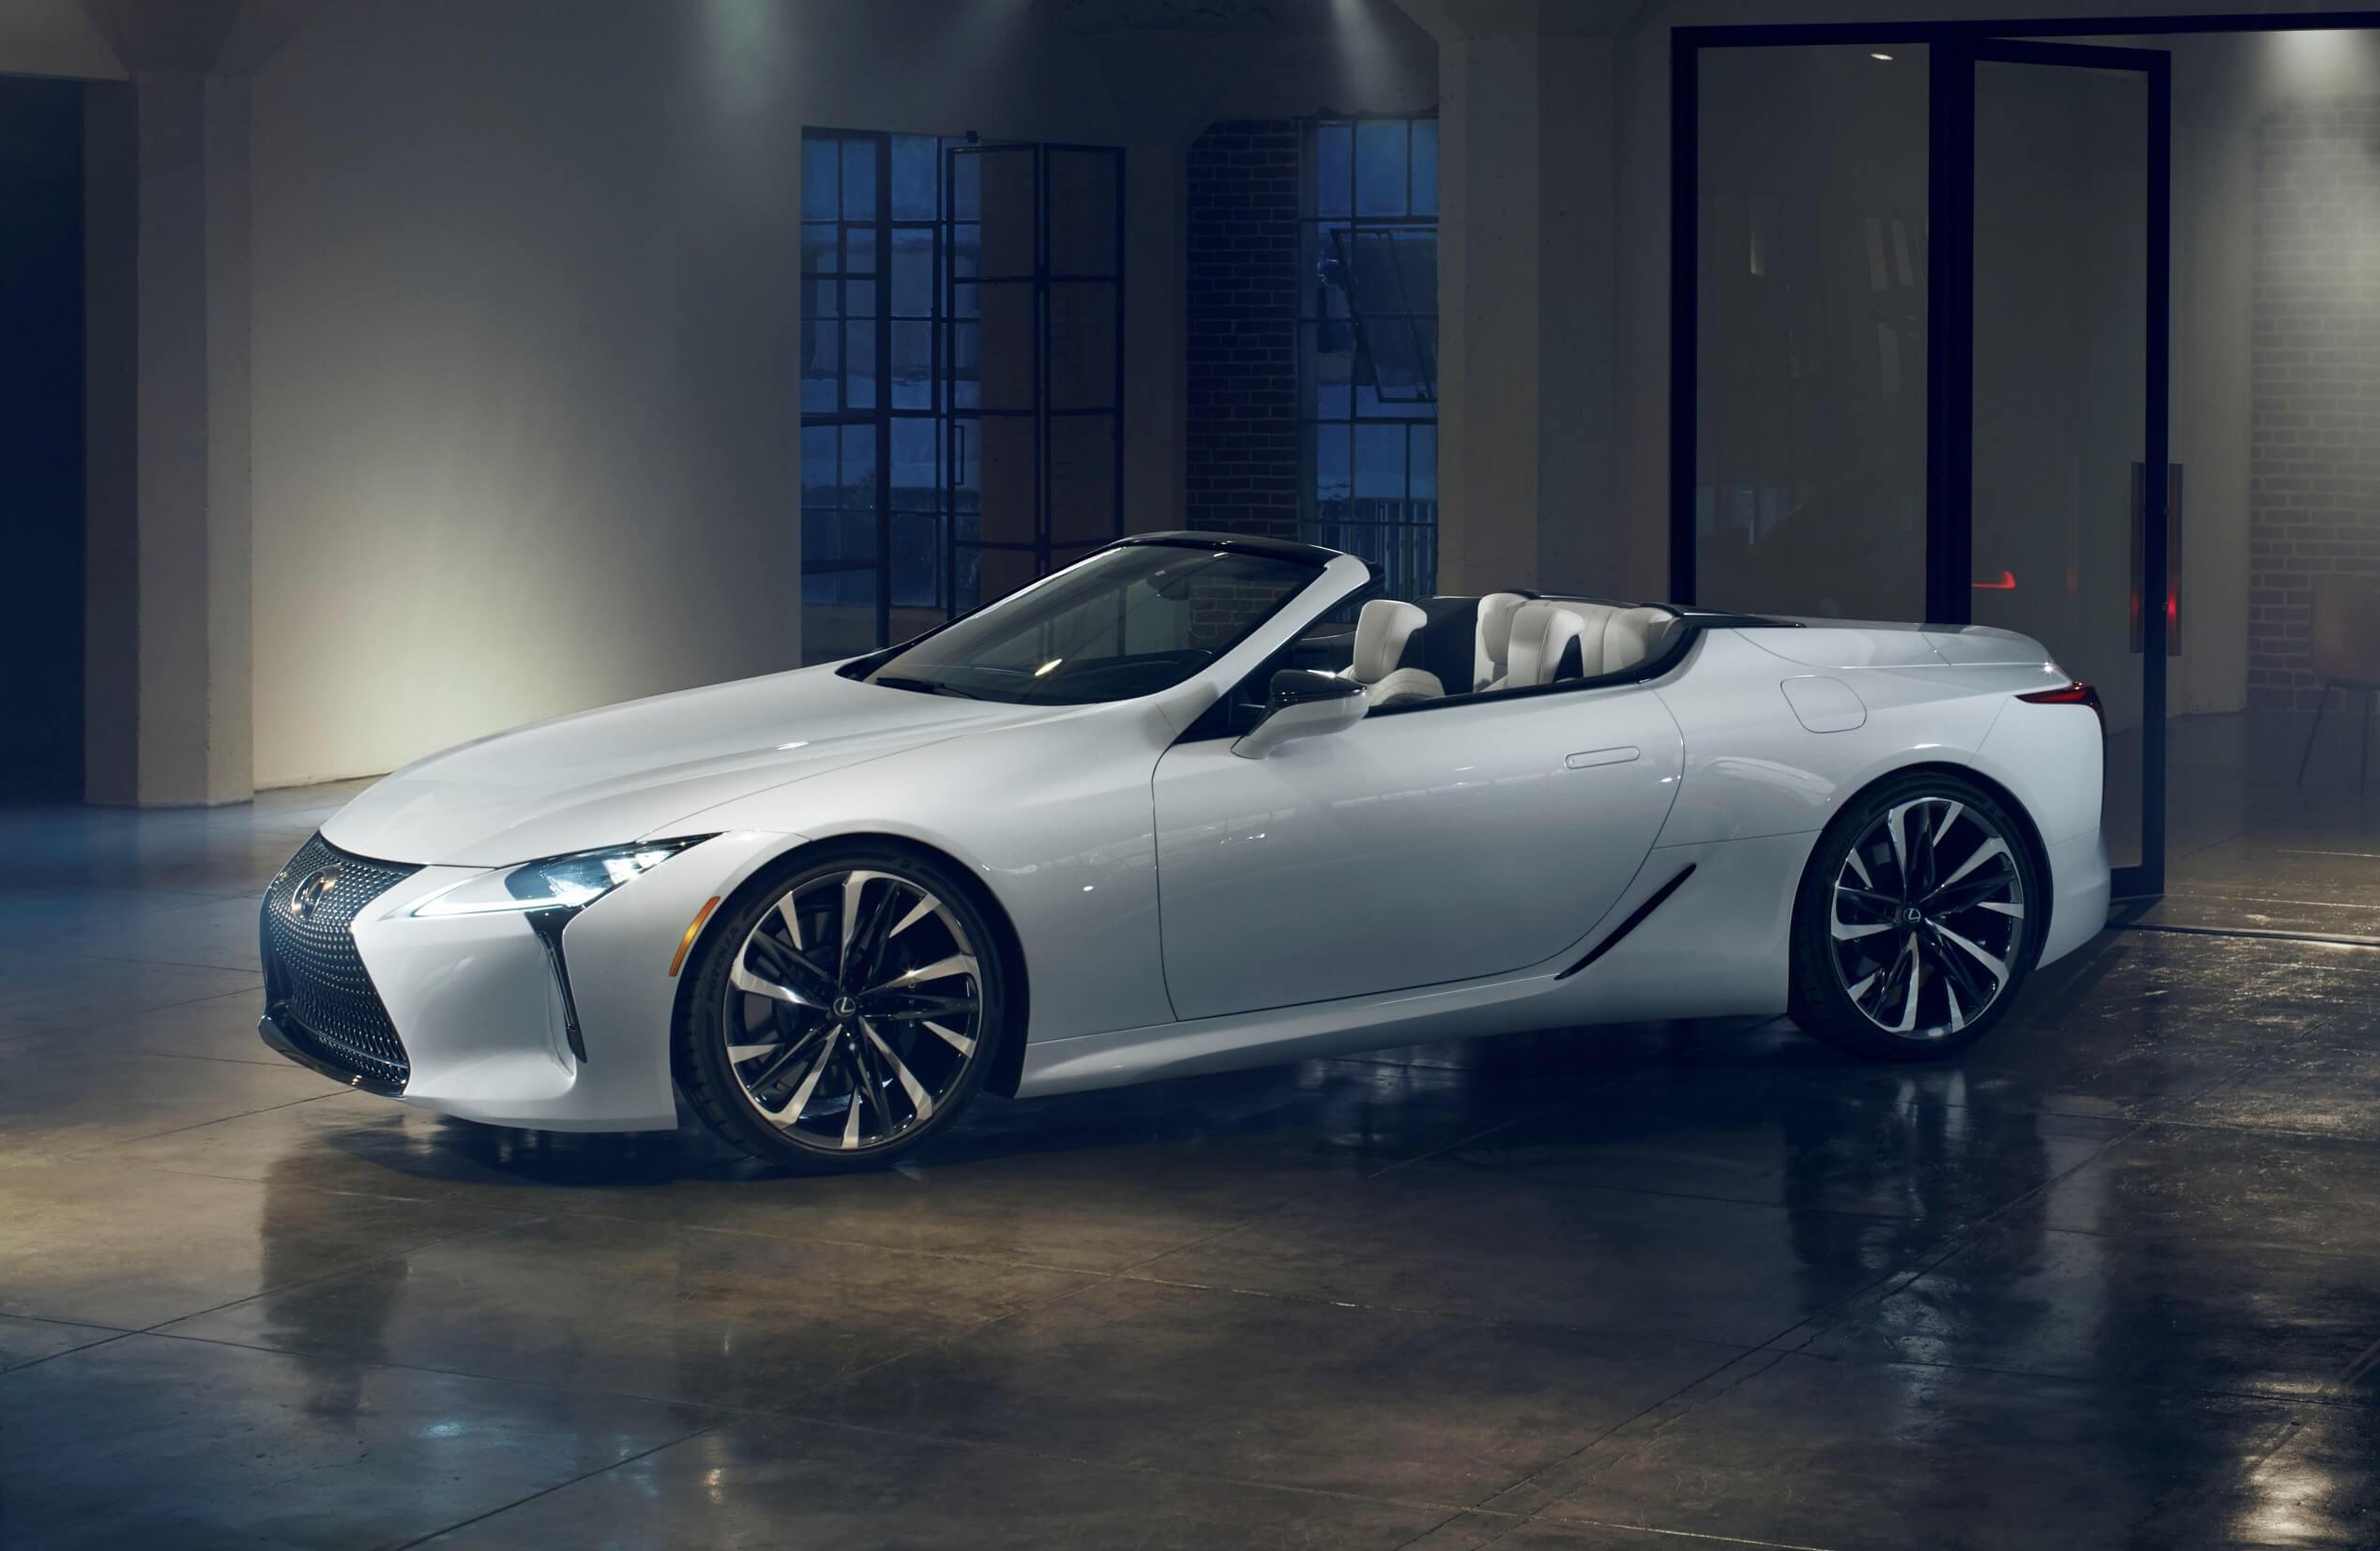 Concept Lexus LC descapotavel apresentado no salao de detroit 2019